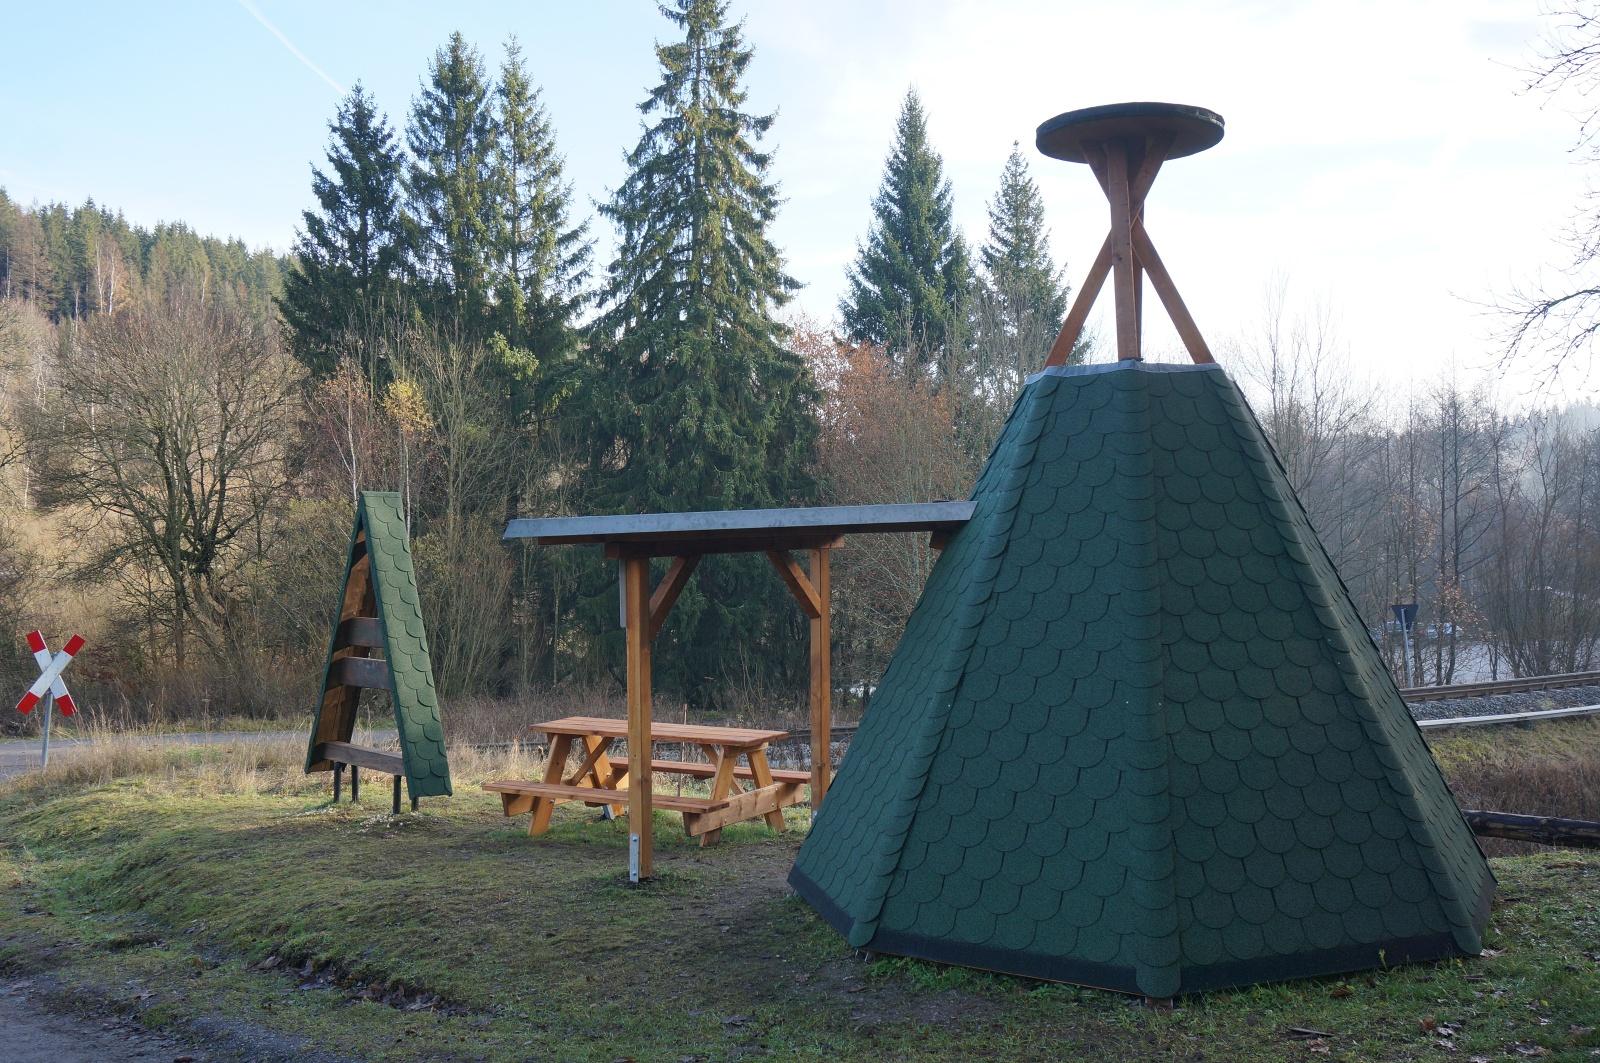 Köte im Stil einer Köhlerhütte am Ortsrand